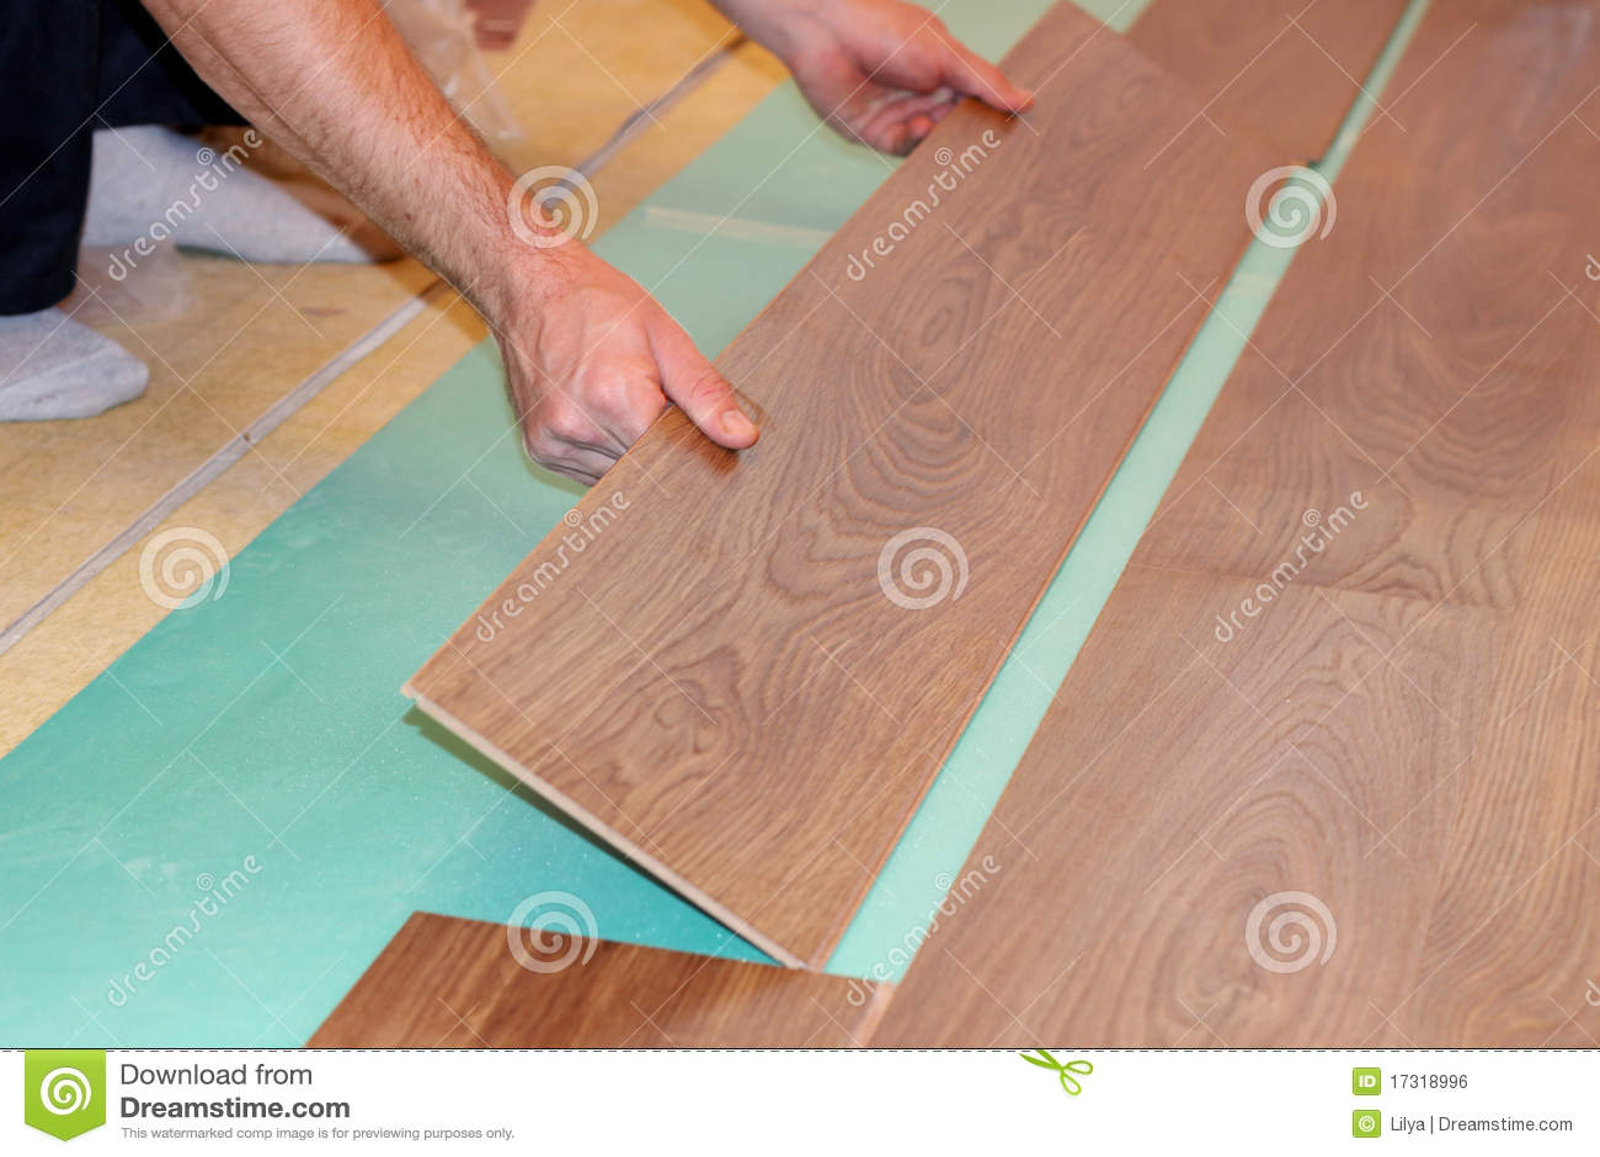 Laying Laminate FlooringClaSsiAneT for. Laying laminate flooring